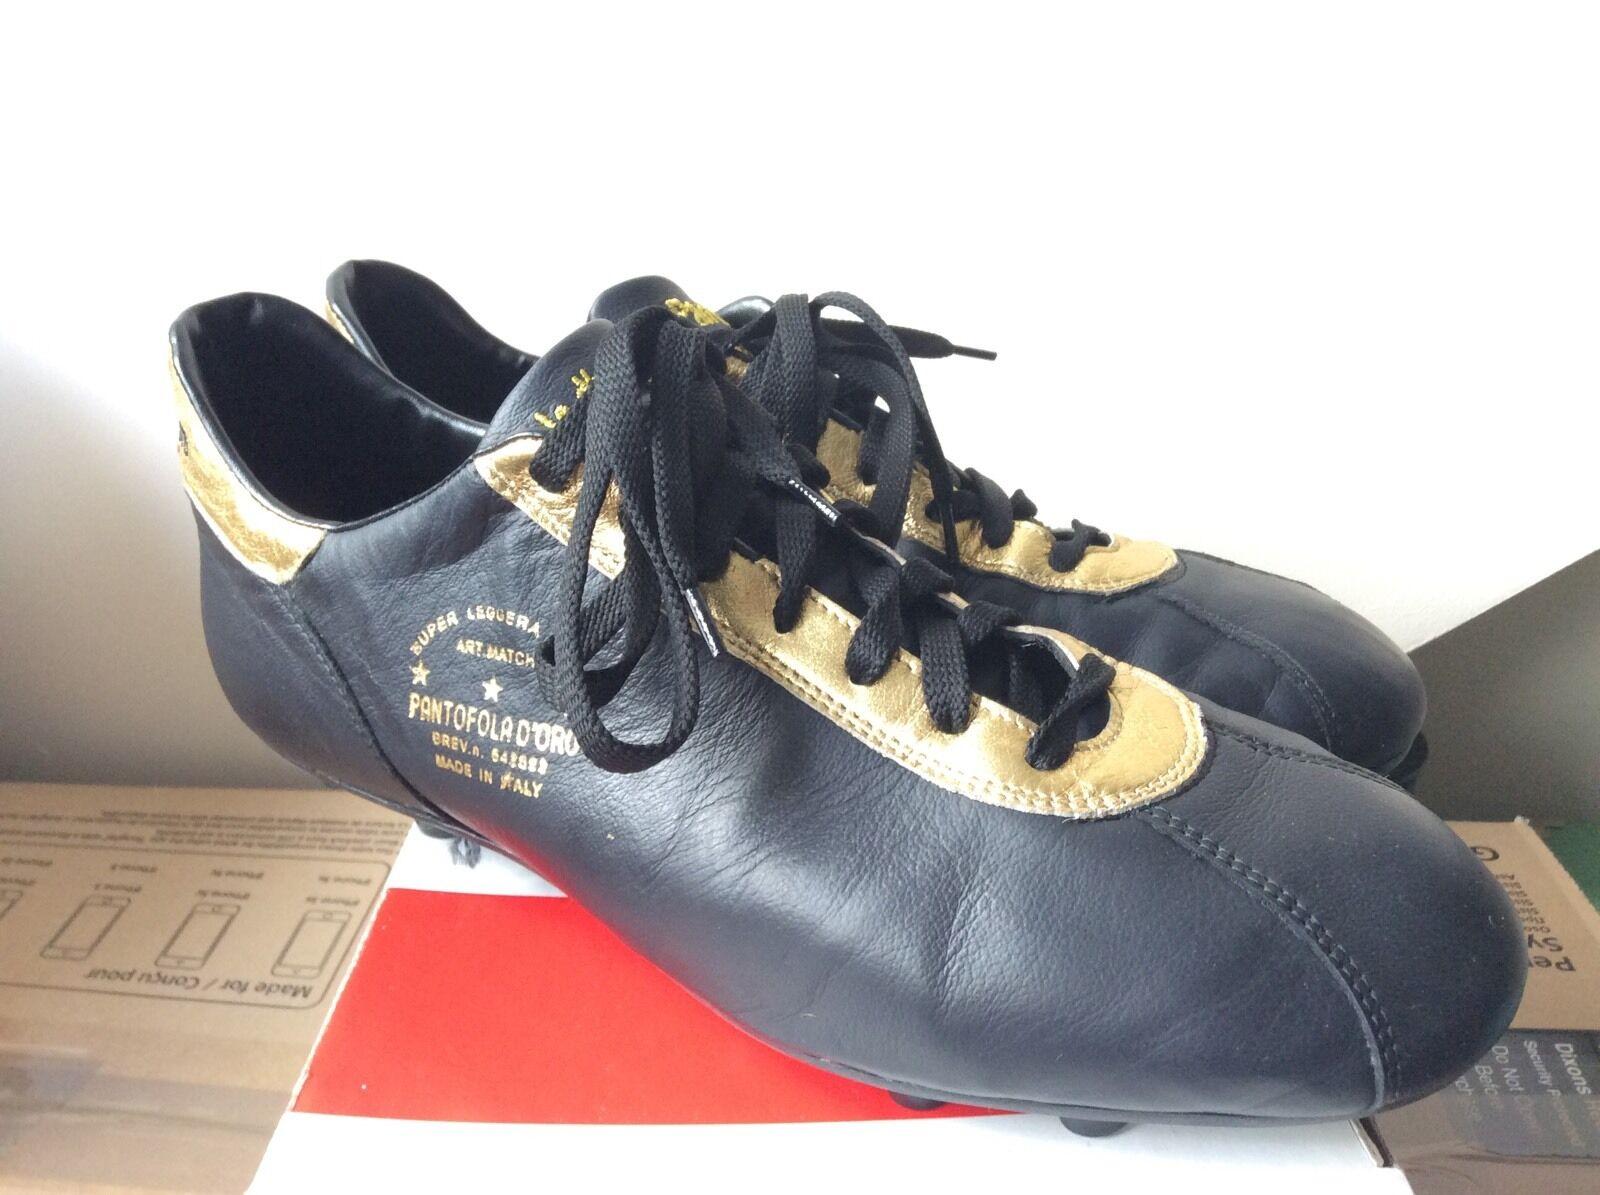 Herren Pantofola D'Oro Antares Canguro Fg Football Stiefel Uk Größe 11